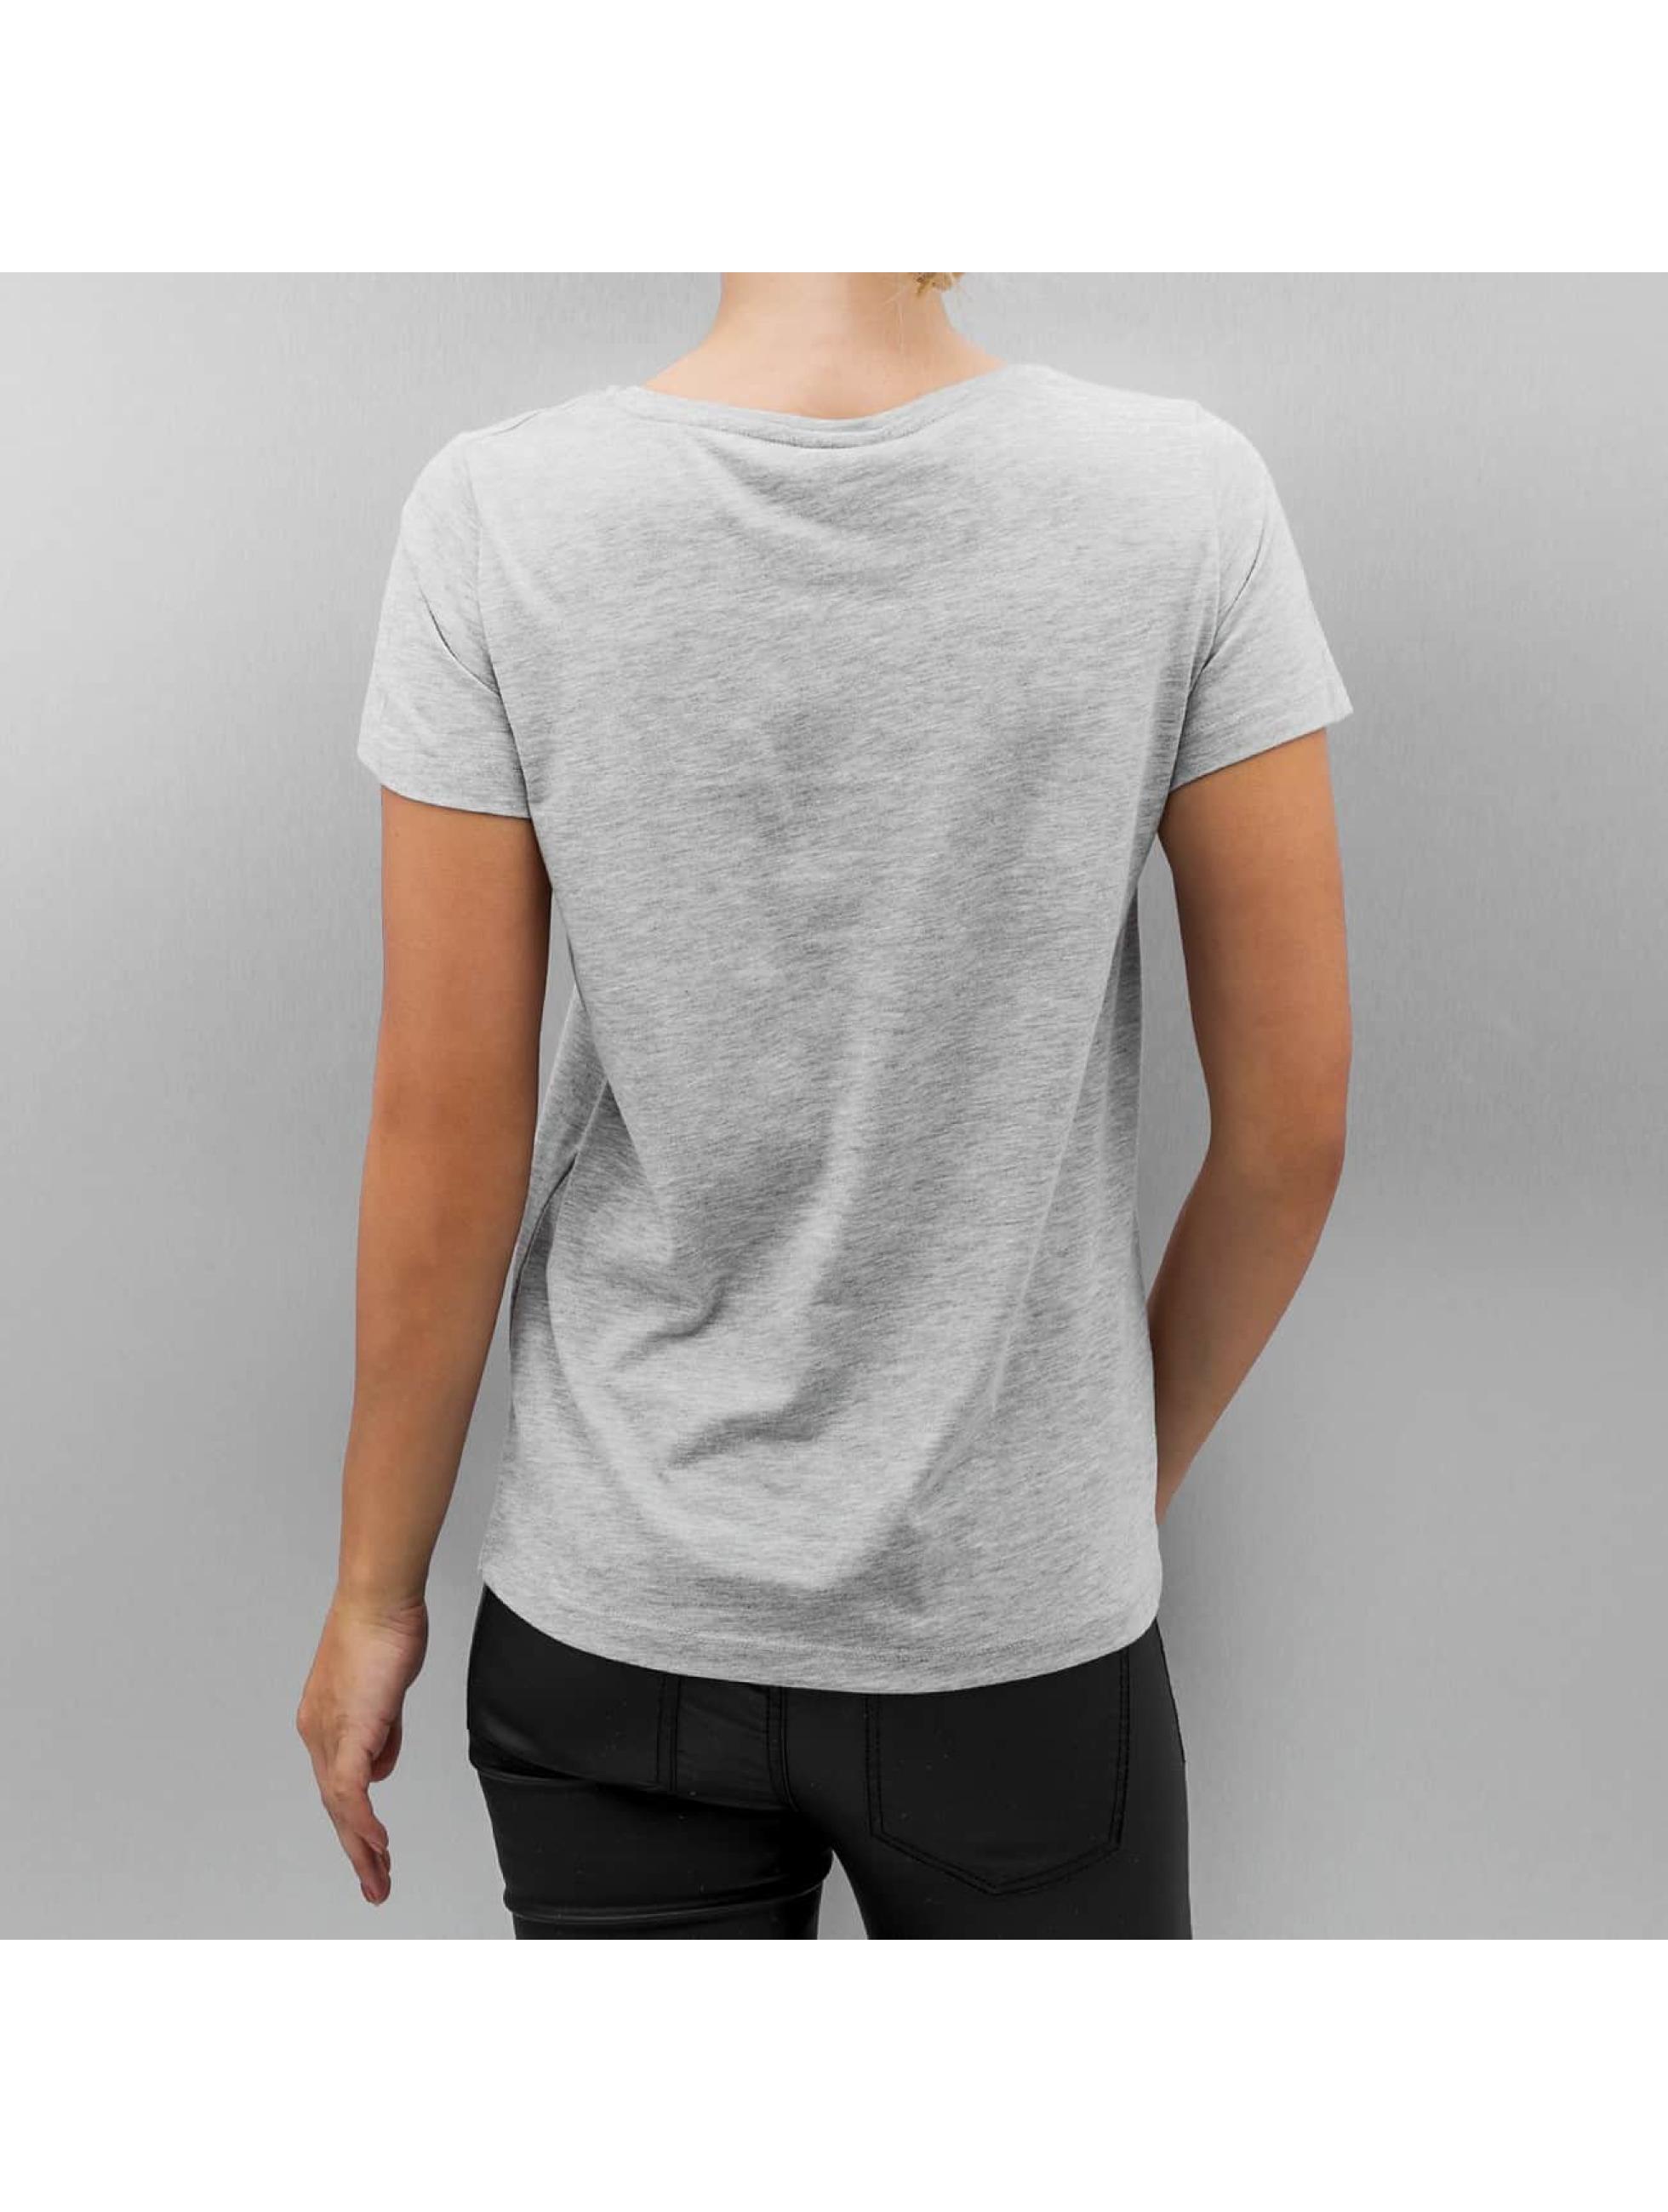 Vero Moda T-Shirt VmMy gray